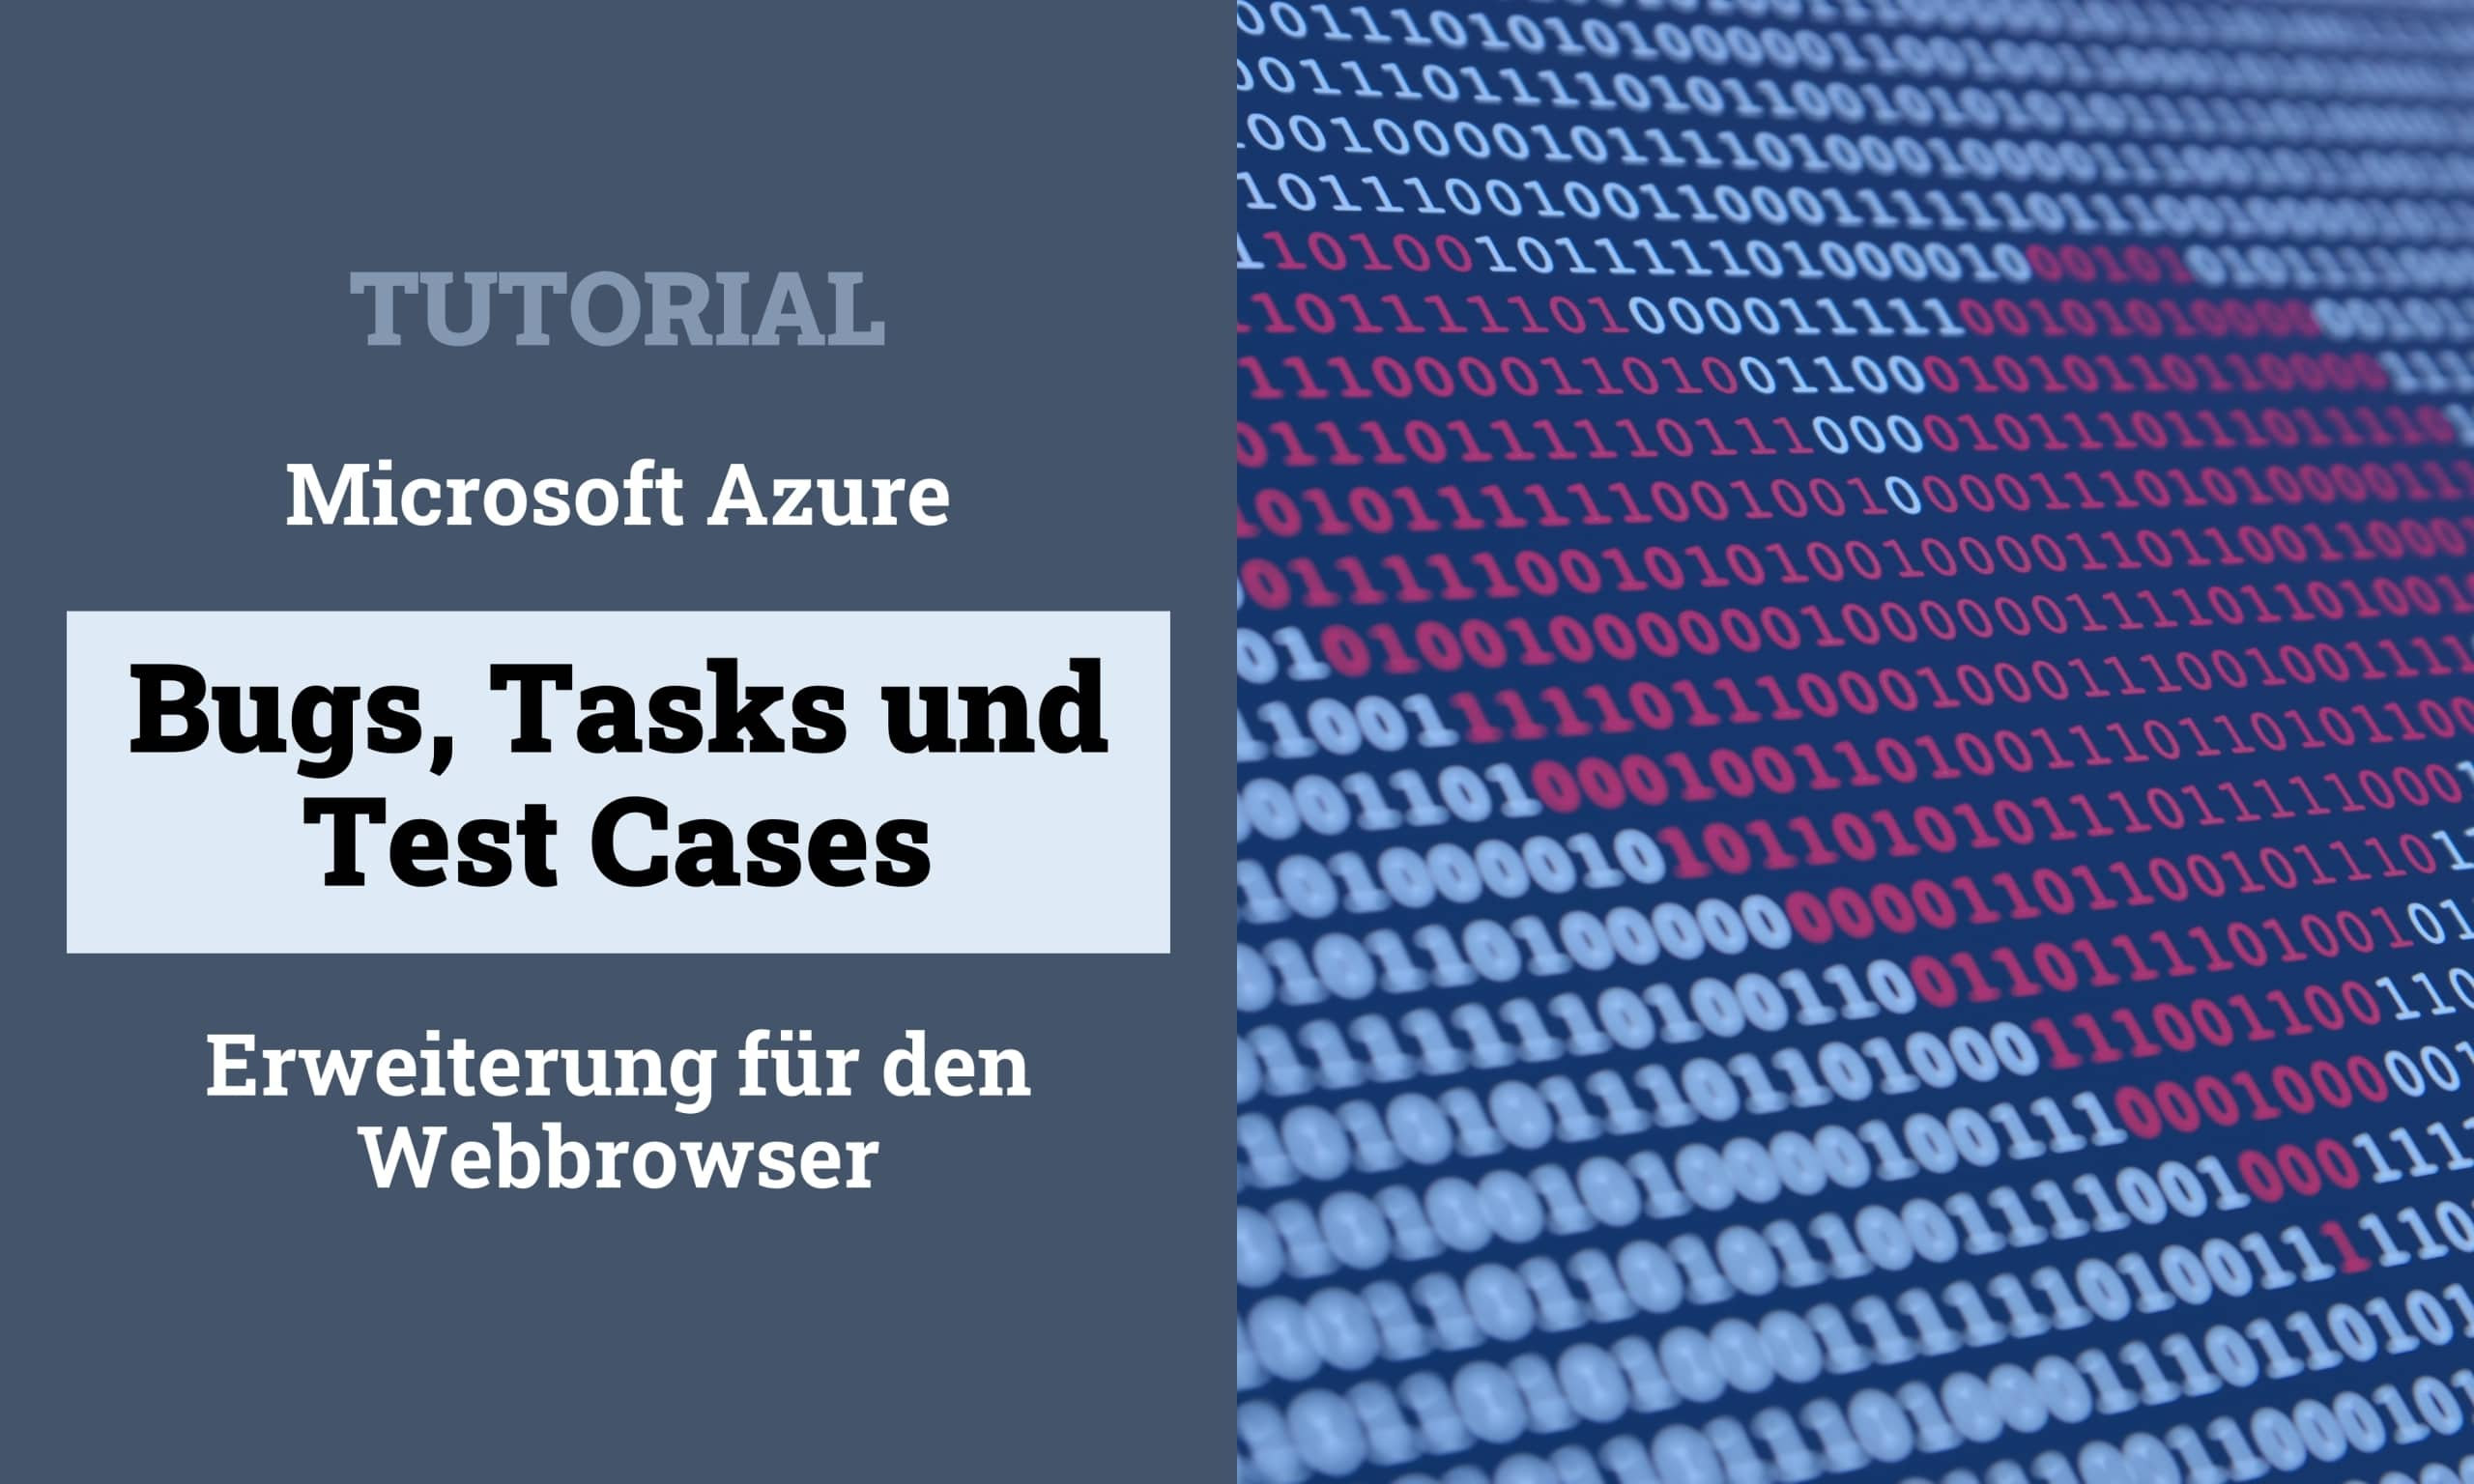 Microsoft Azure DevOps Test and Feedback Titelbild scaled